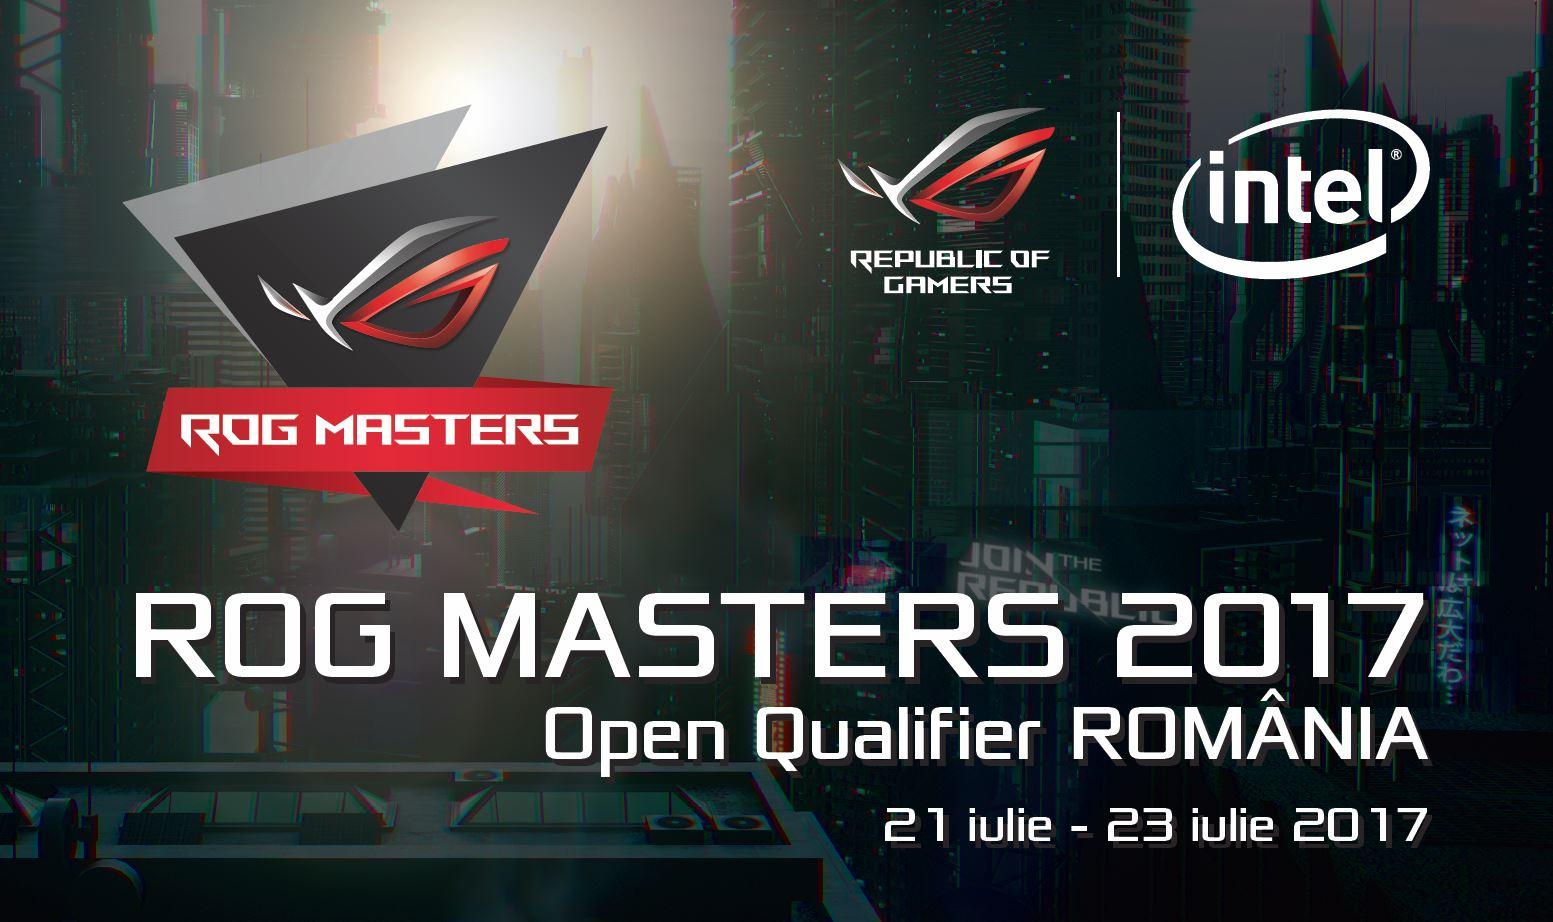 ROG Masters Open Qualifier România 2017